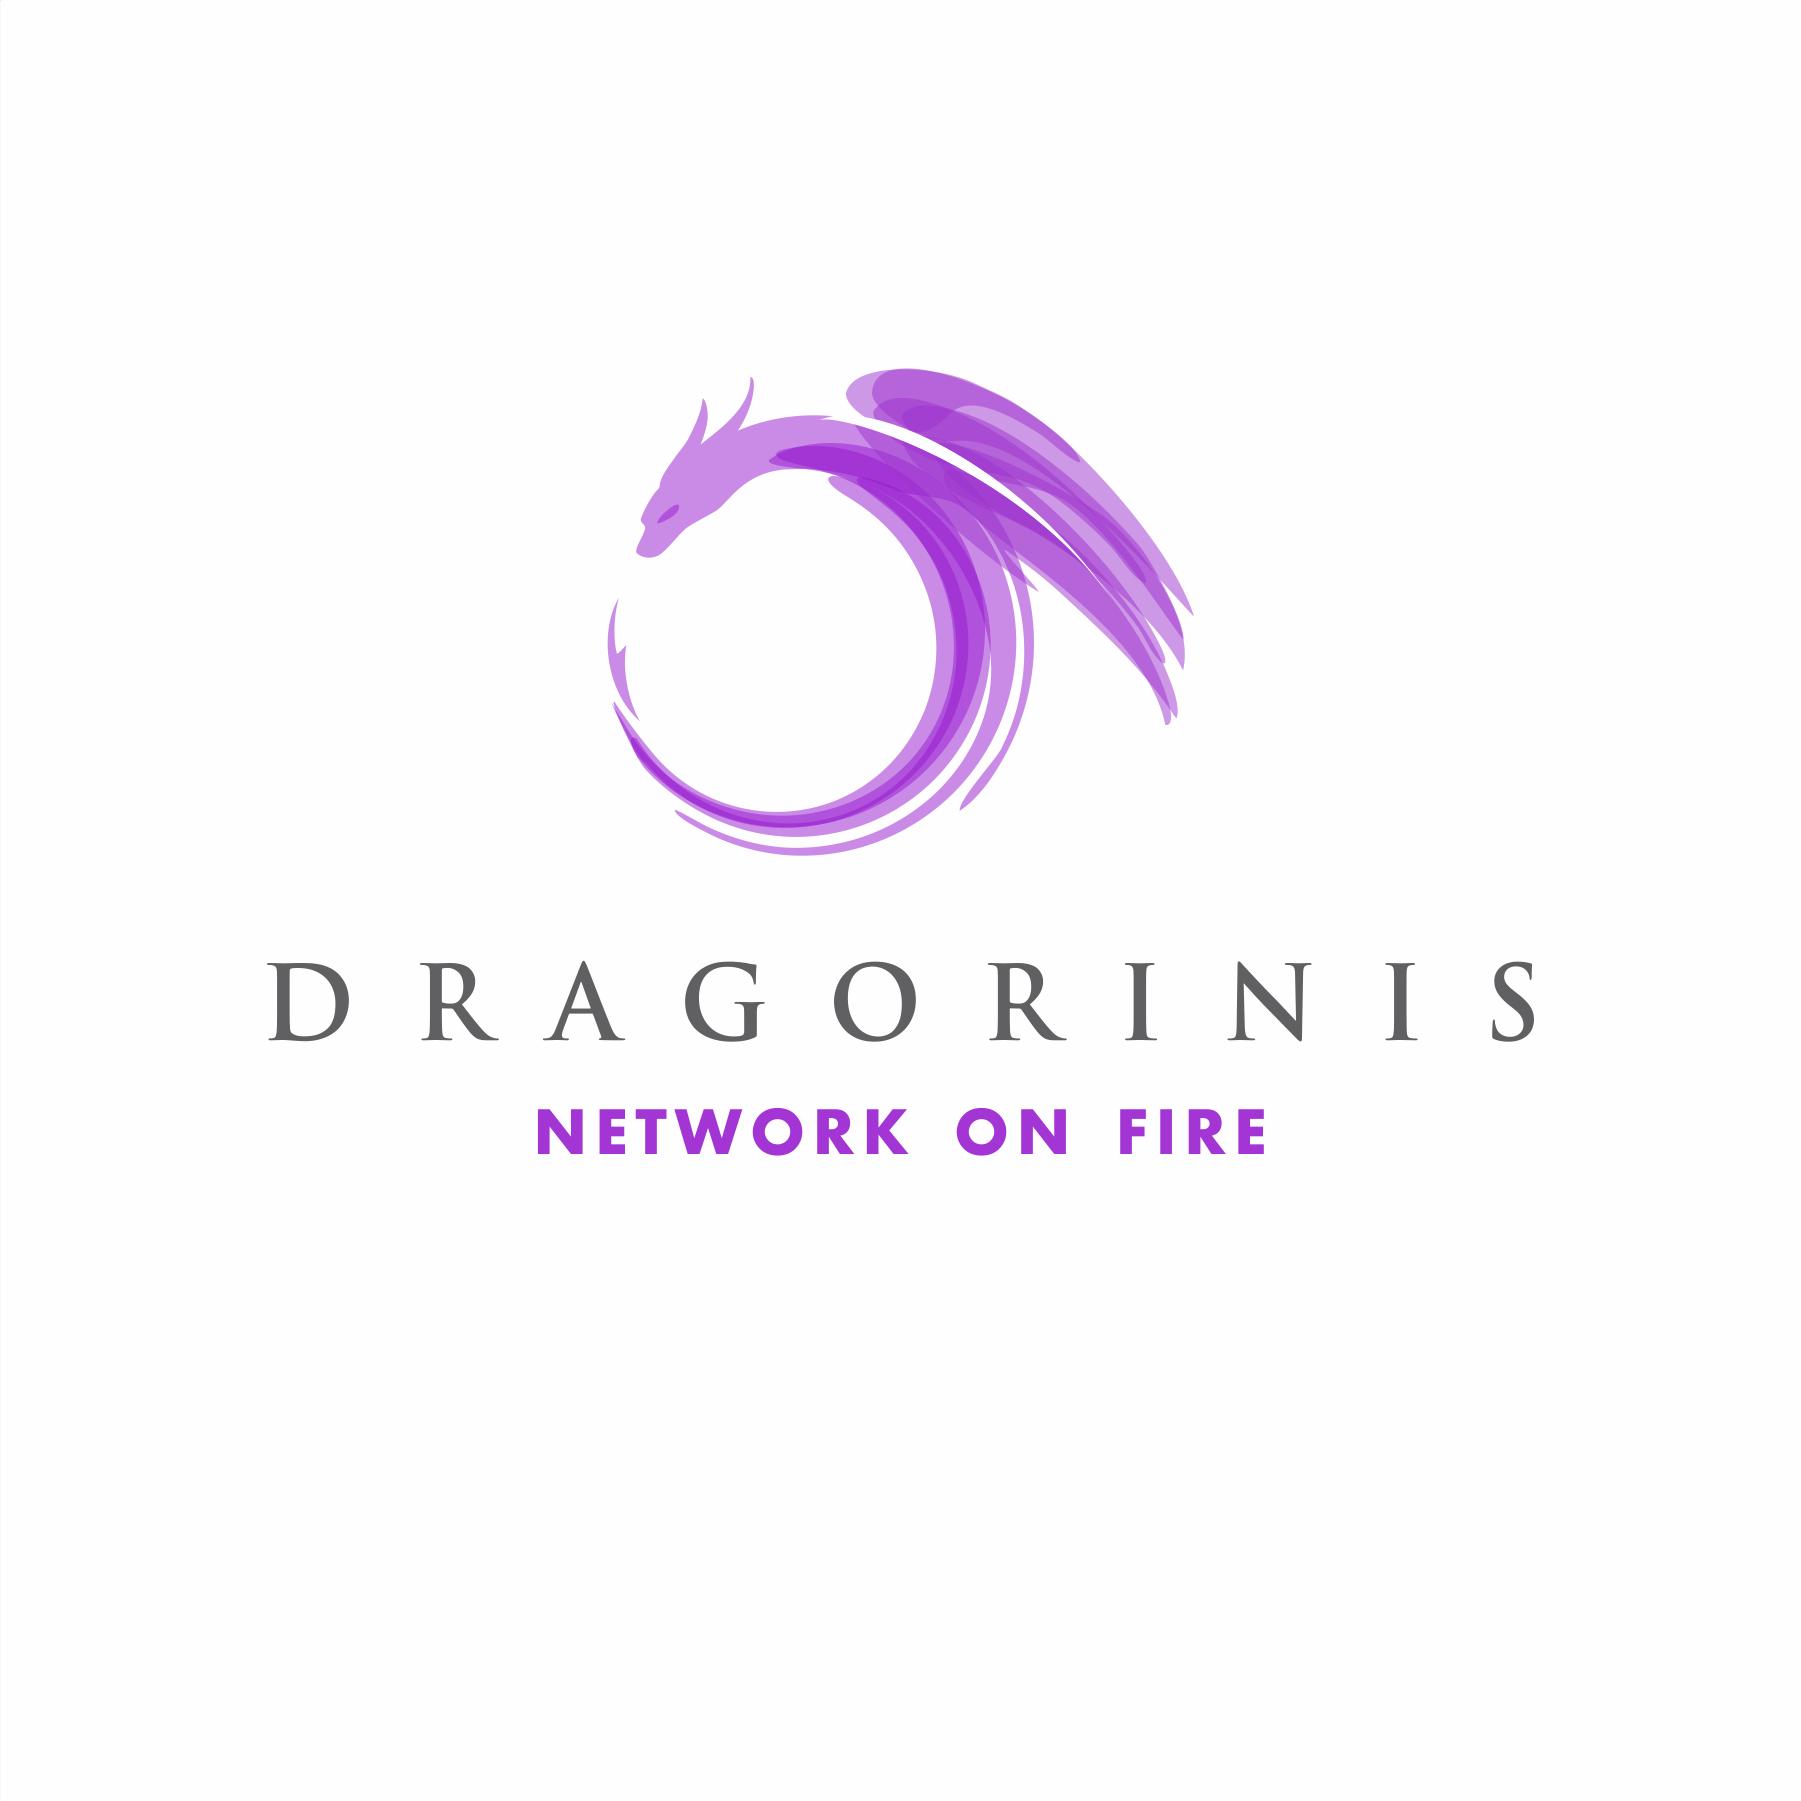 Dragorinis